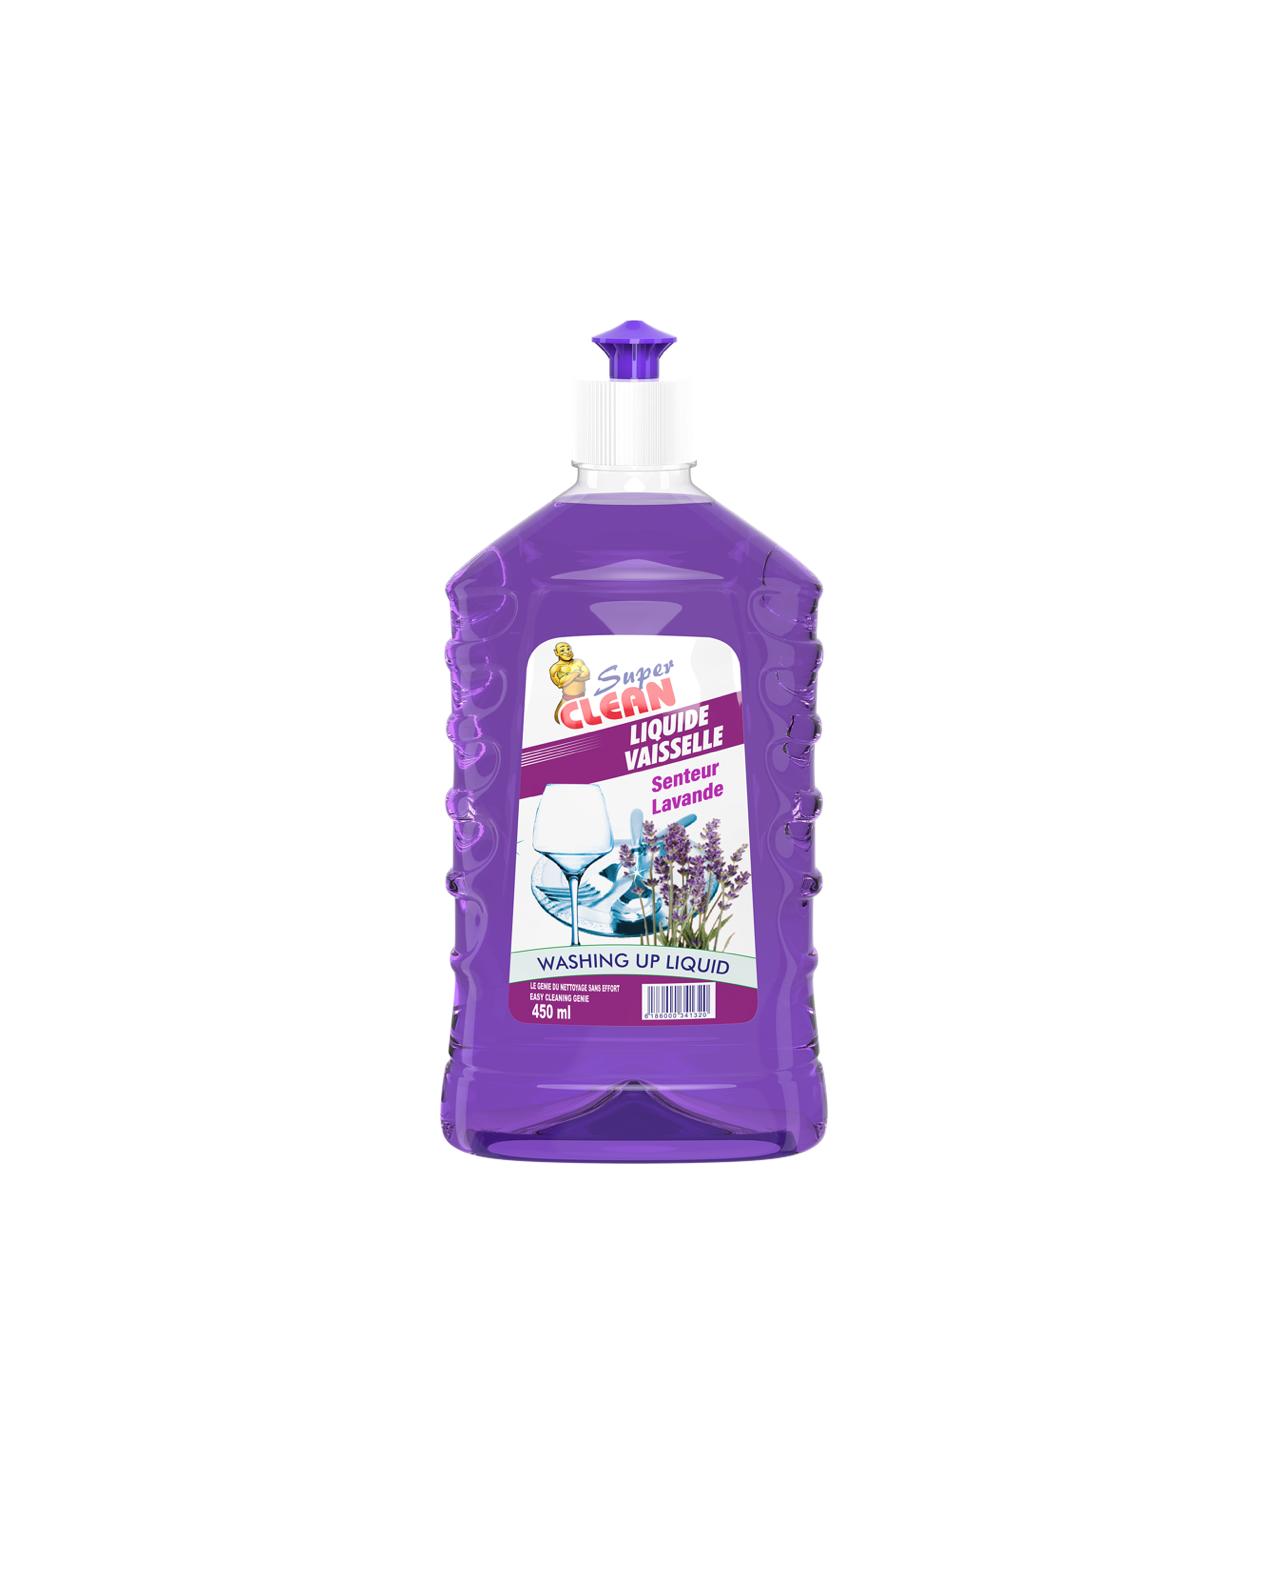 SUPER CLEAN_Liquide Vaisselle Lavande 450ml_Siprochim